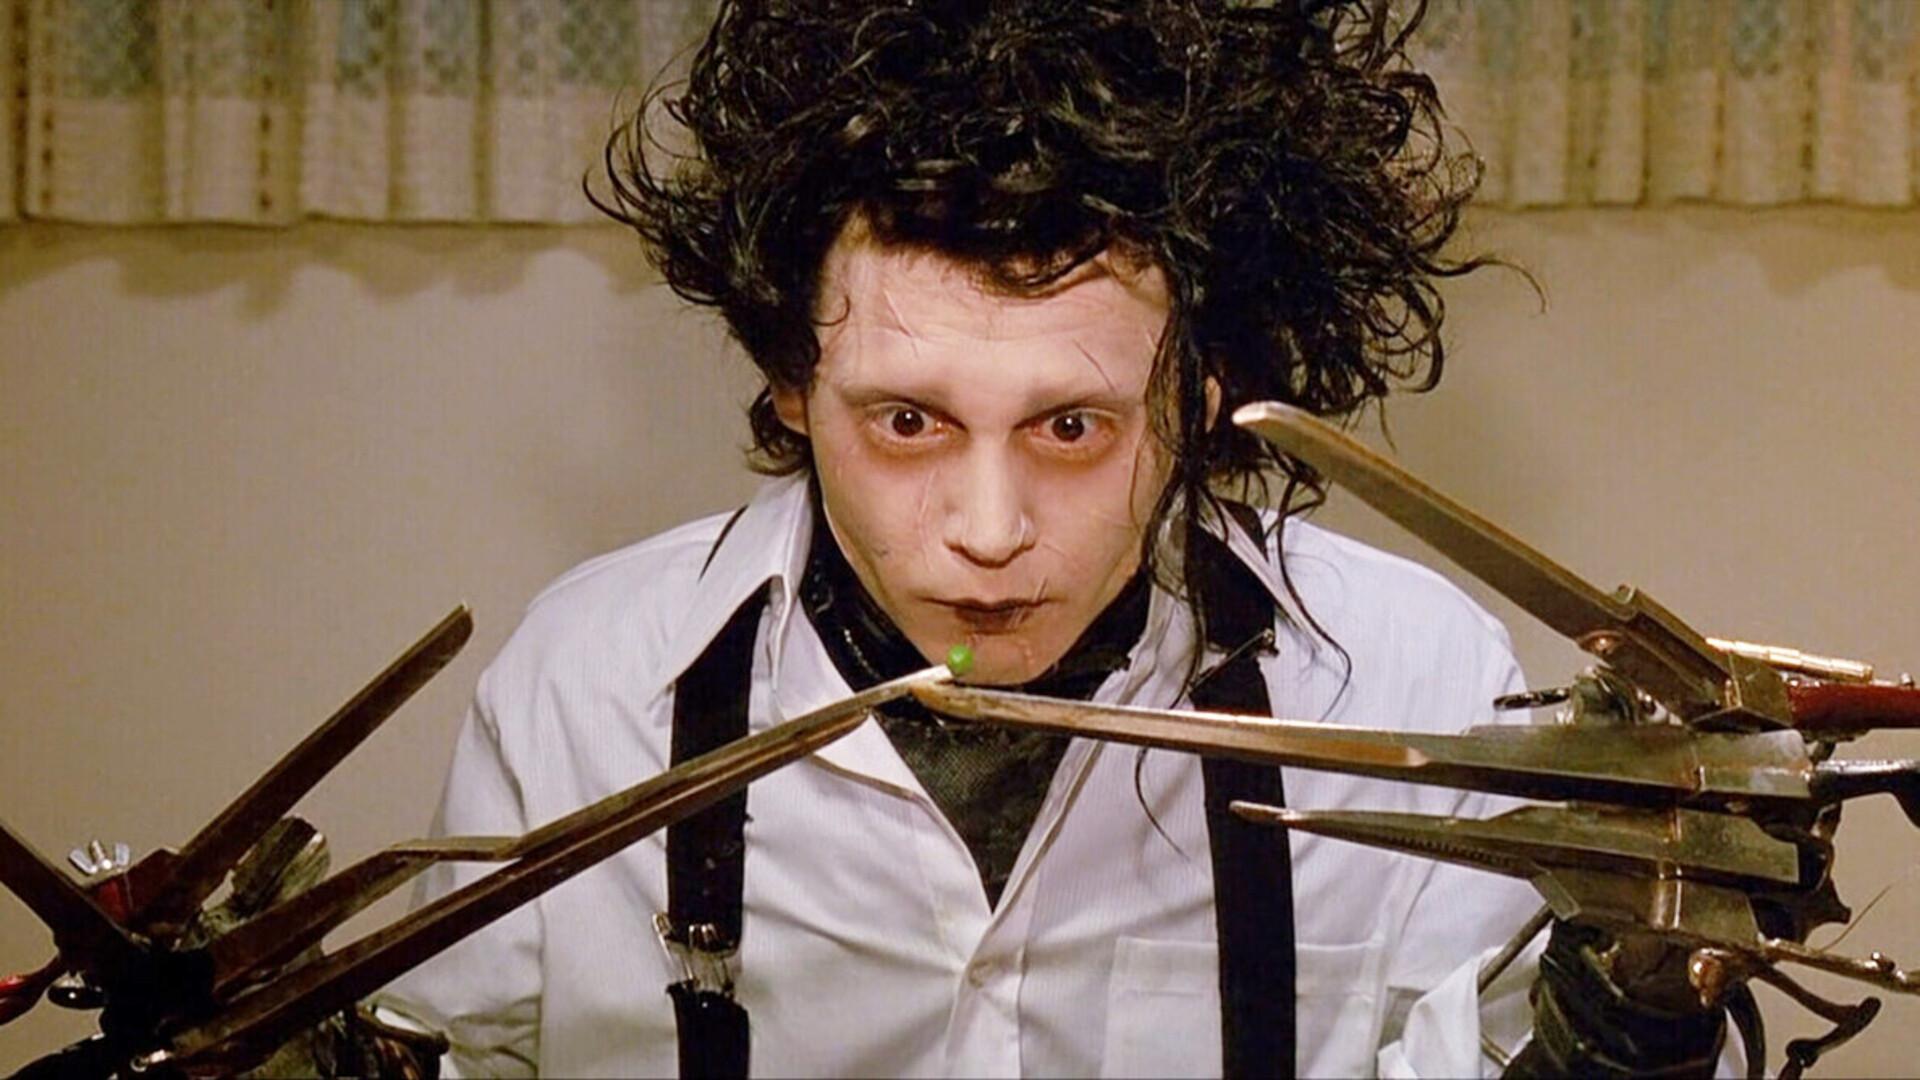 Johnny Depp Reportedly Wants To Return for Edward Scissorhands Sequel